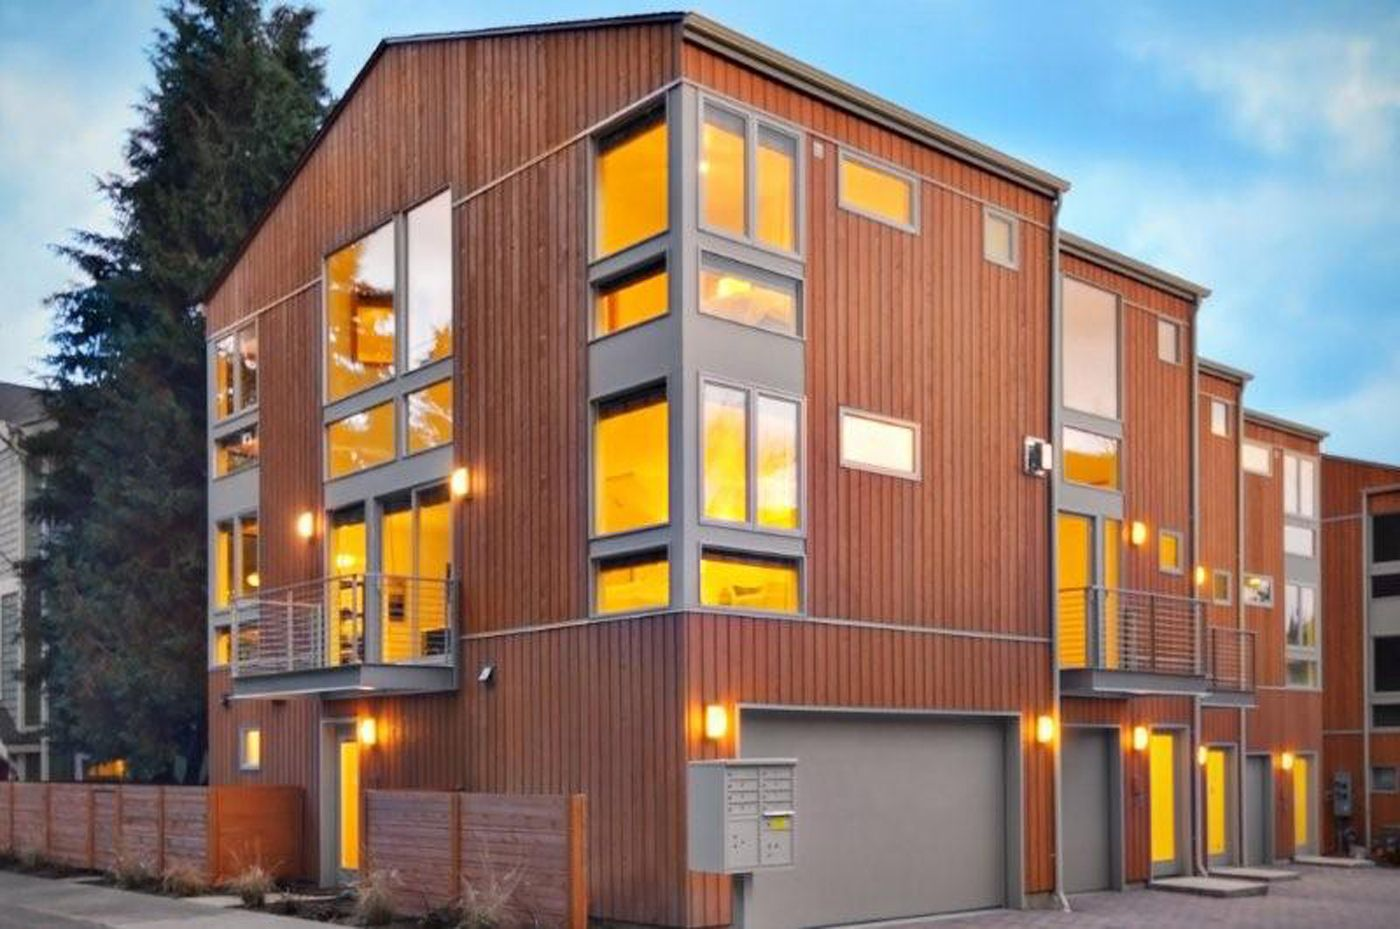 Townhome architecture 4 plex duplex fourplex plans - Interior design institute orange county ...